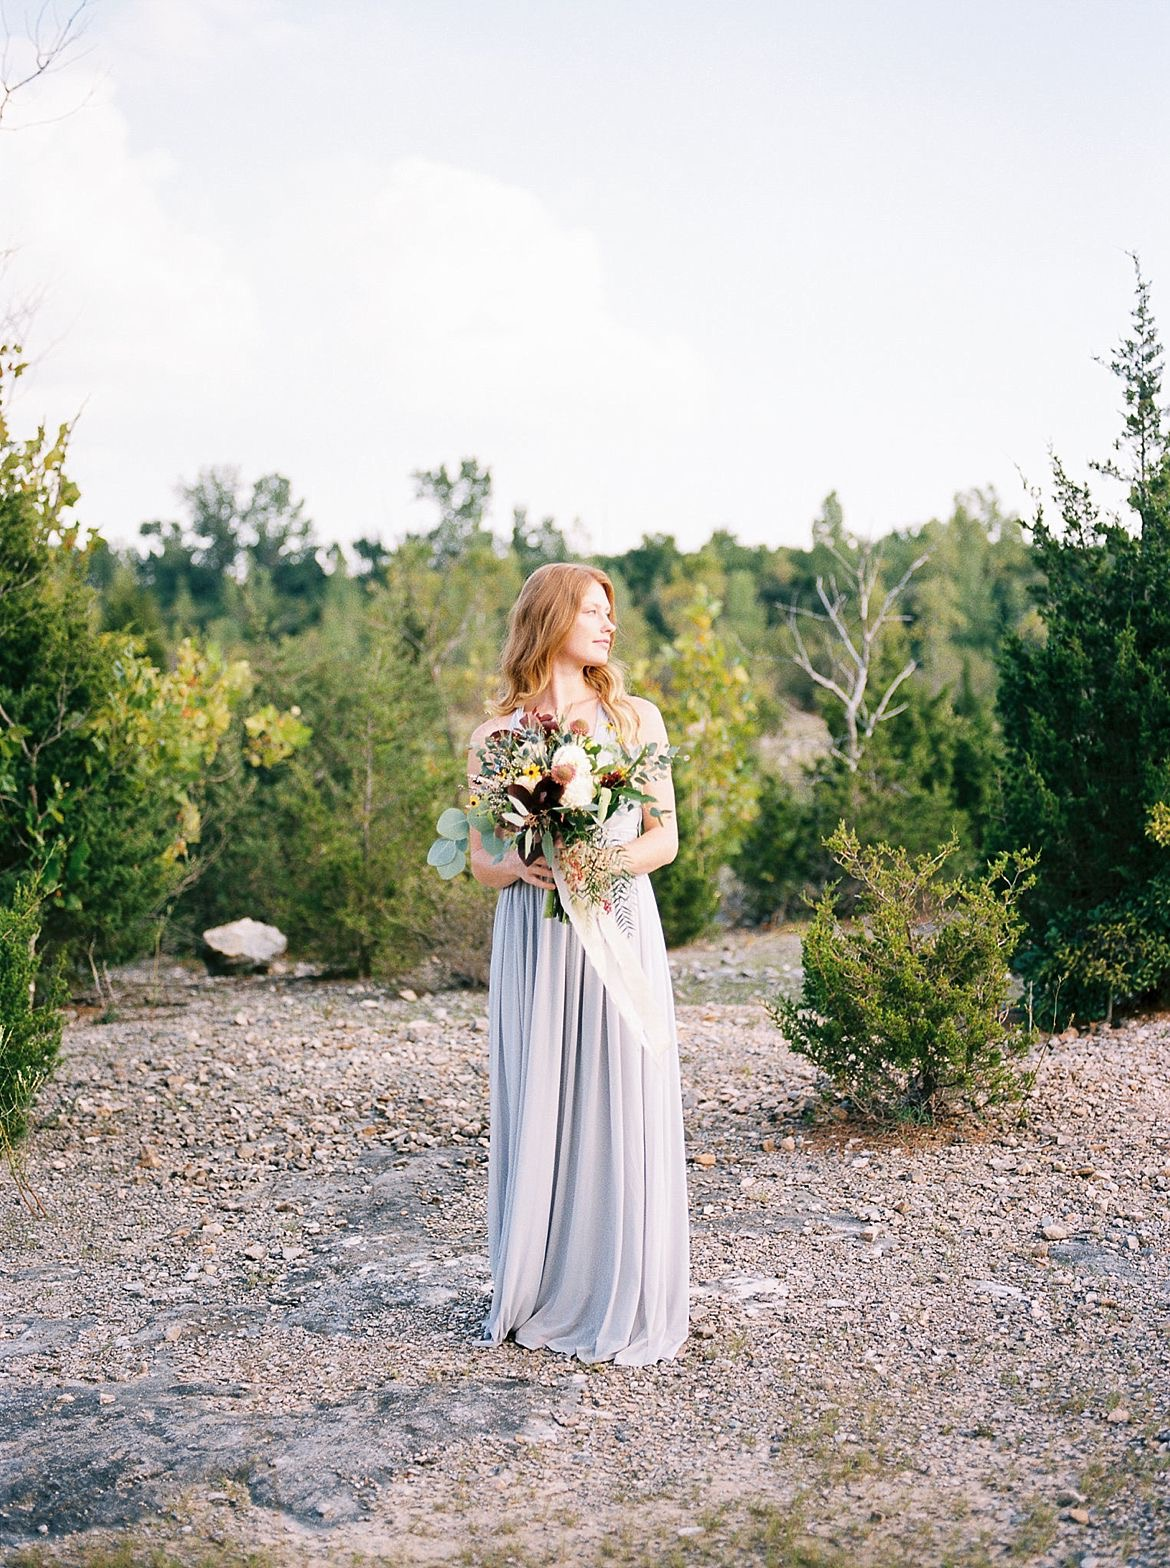 Simple Organic Bridal Inspiration